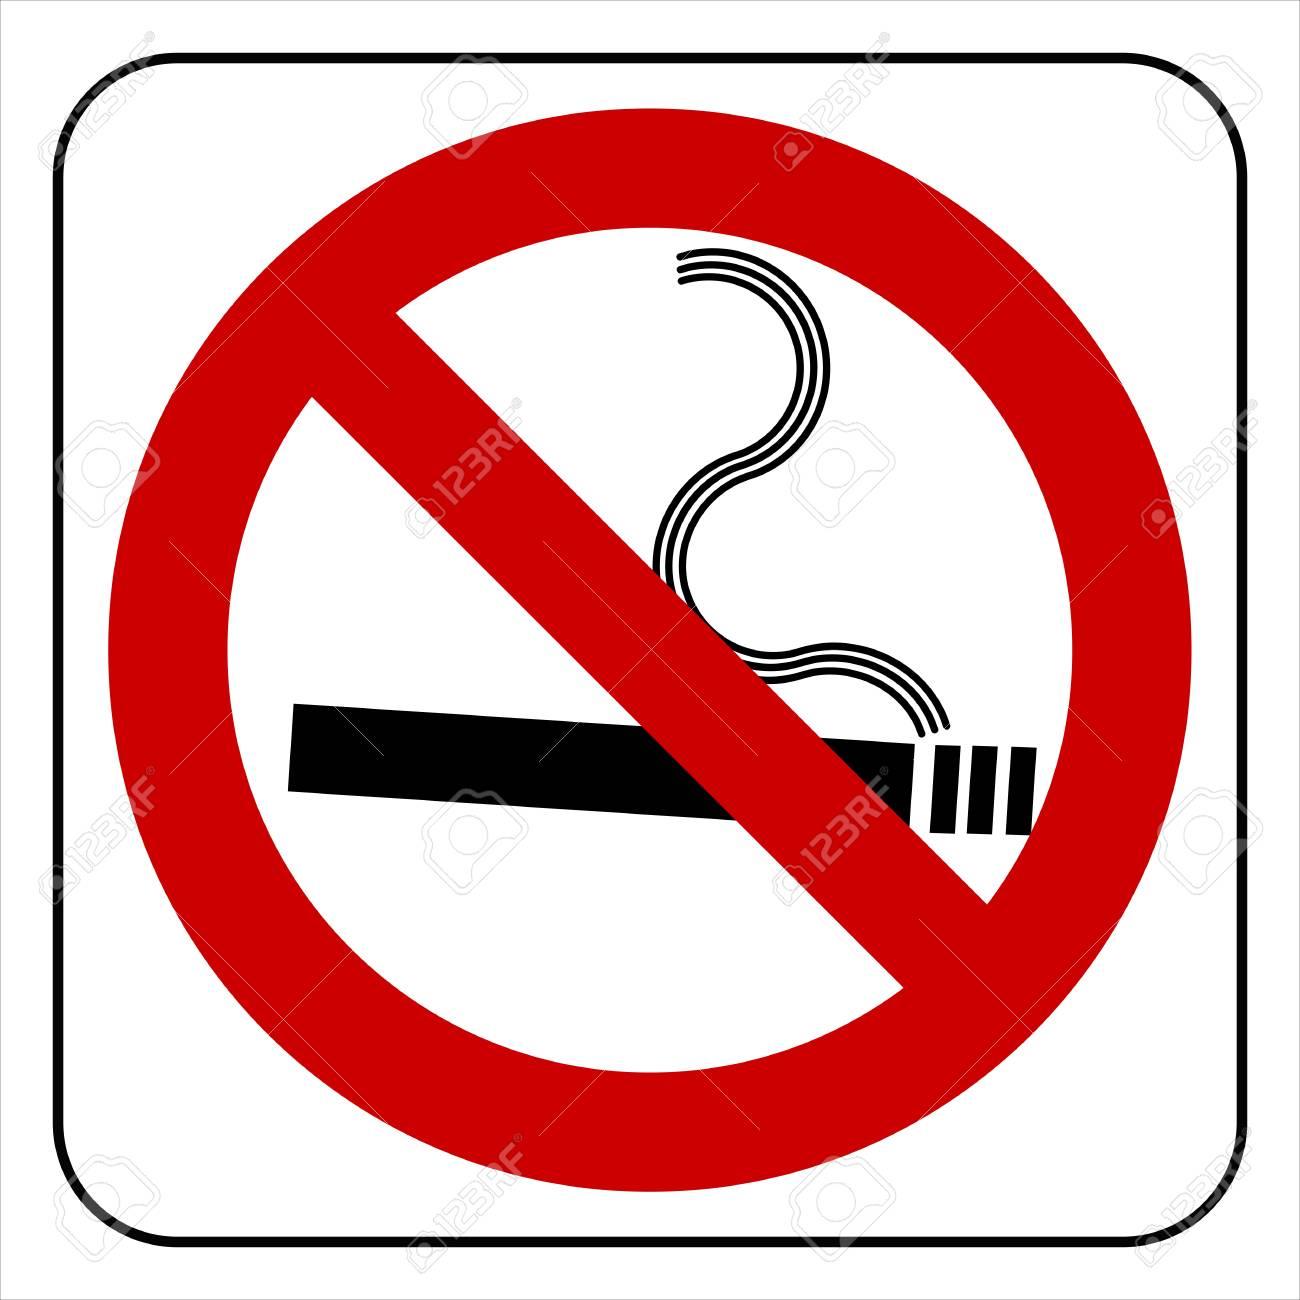 no smoking symbol, vector Stock Photo - 20240507